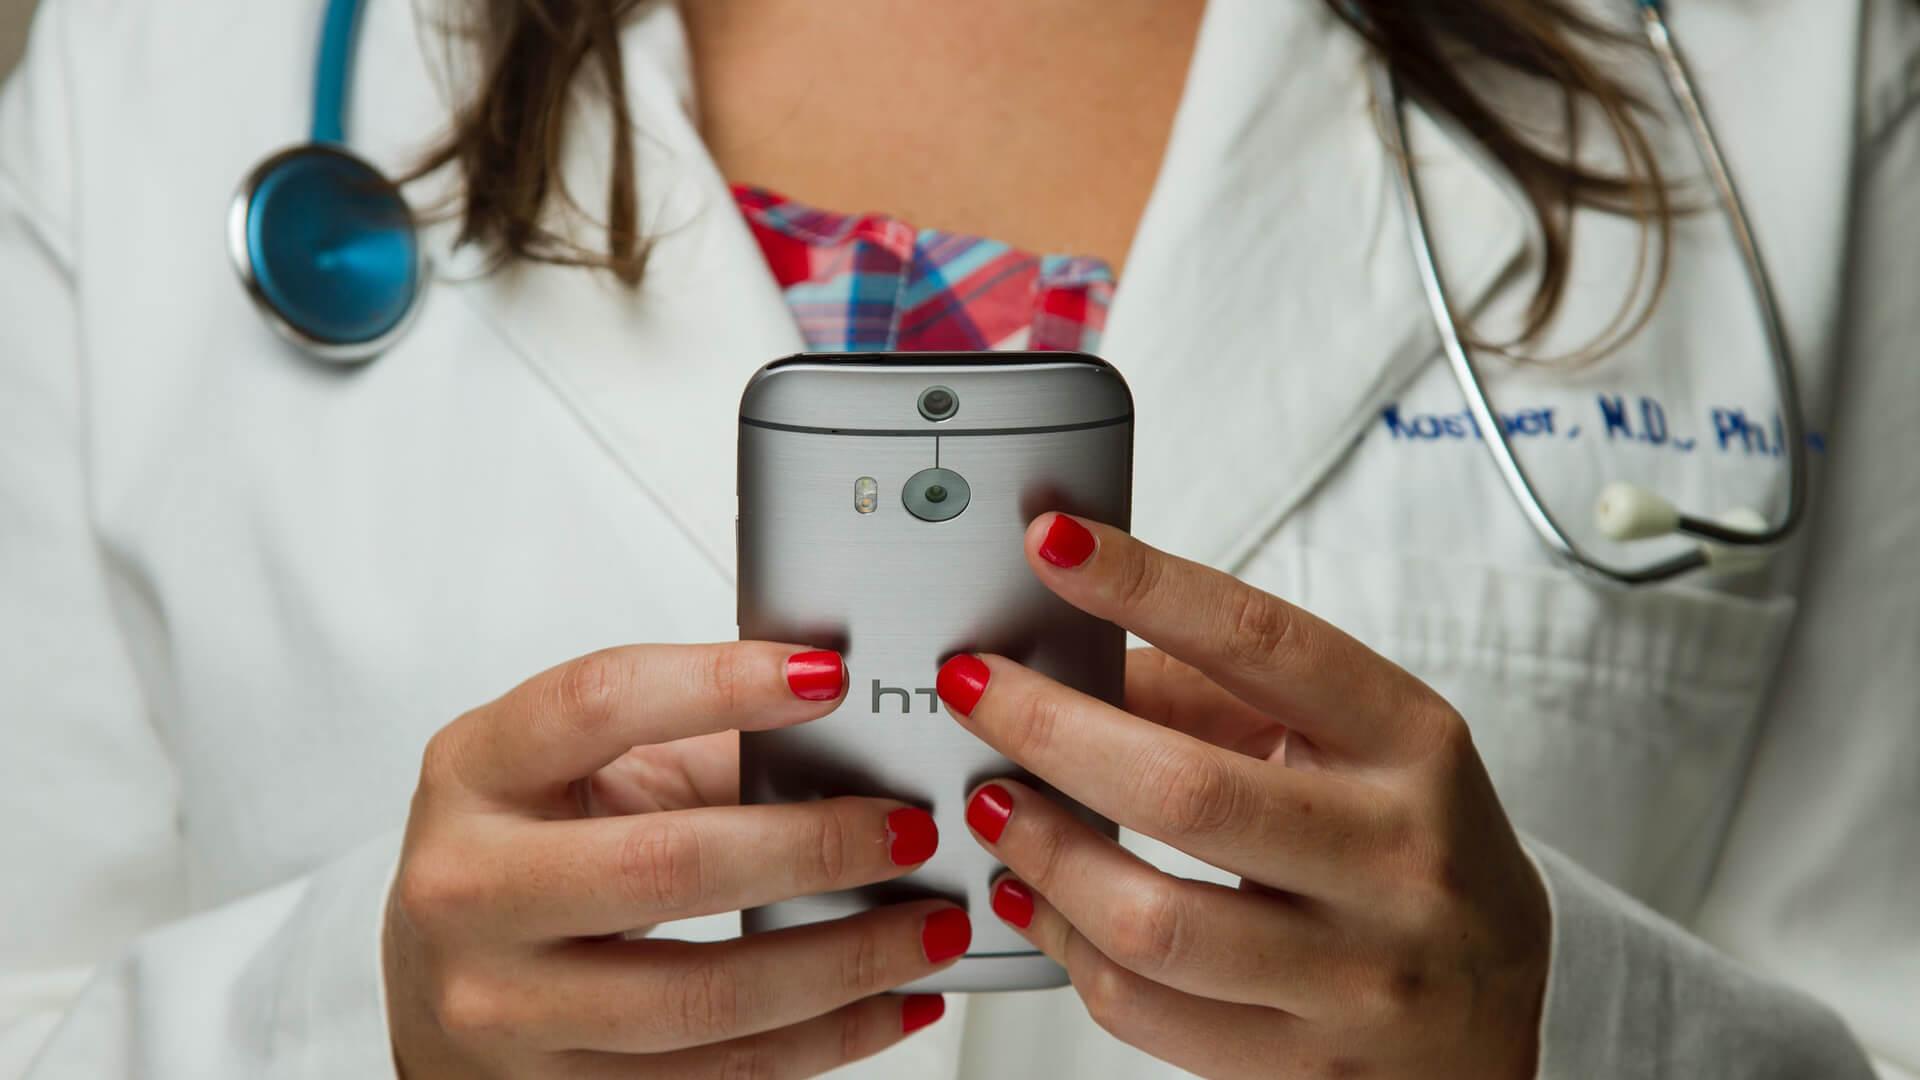 Médica a usar telemóvel